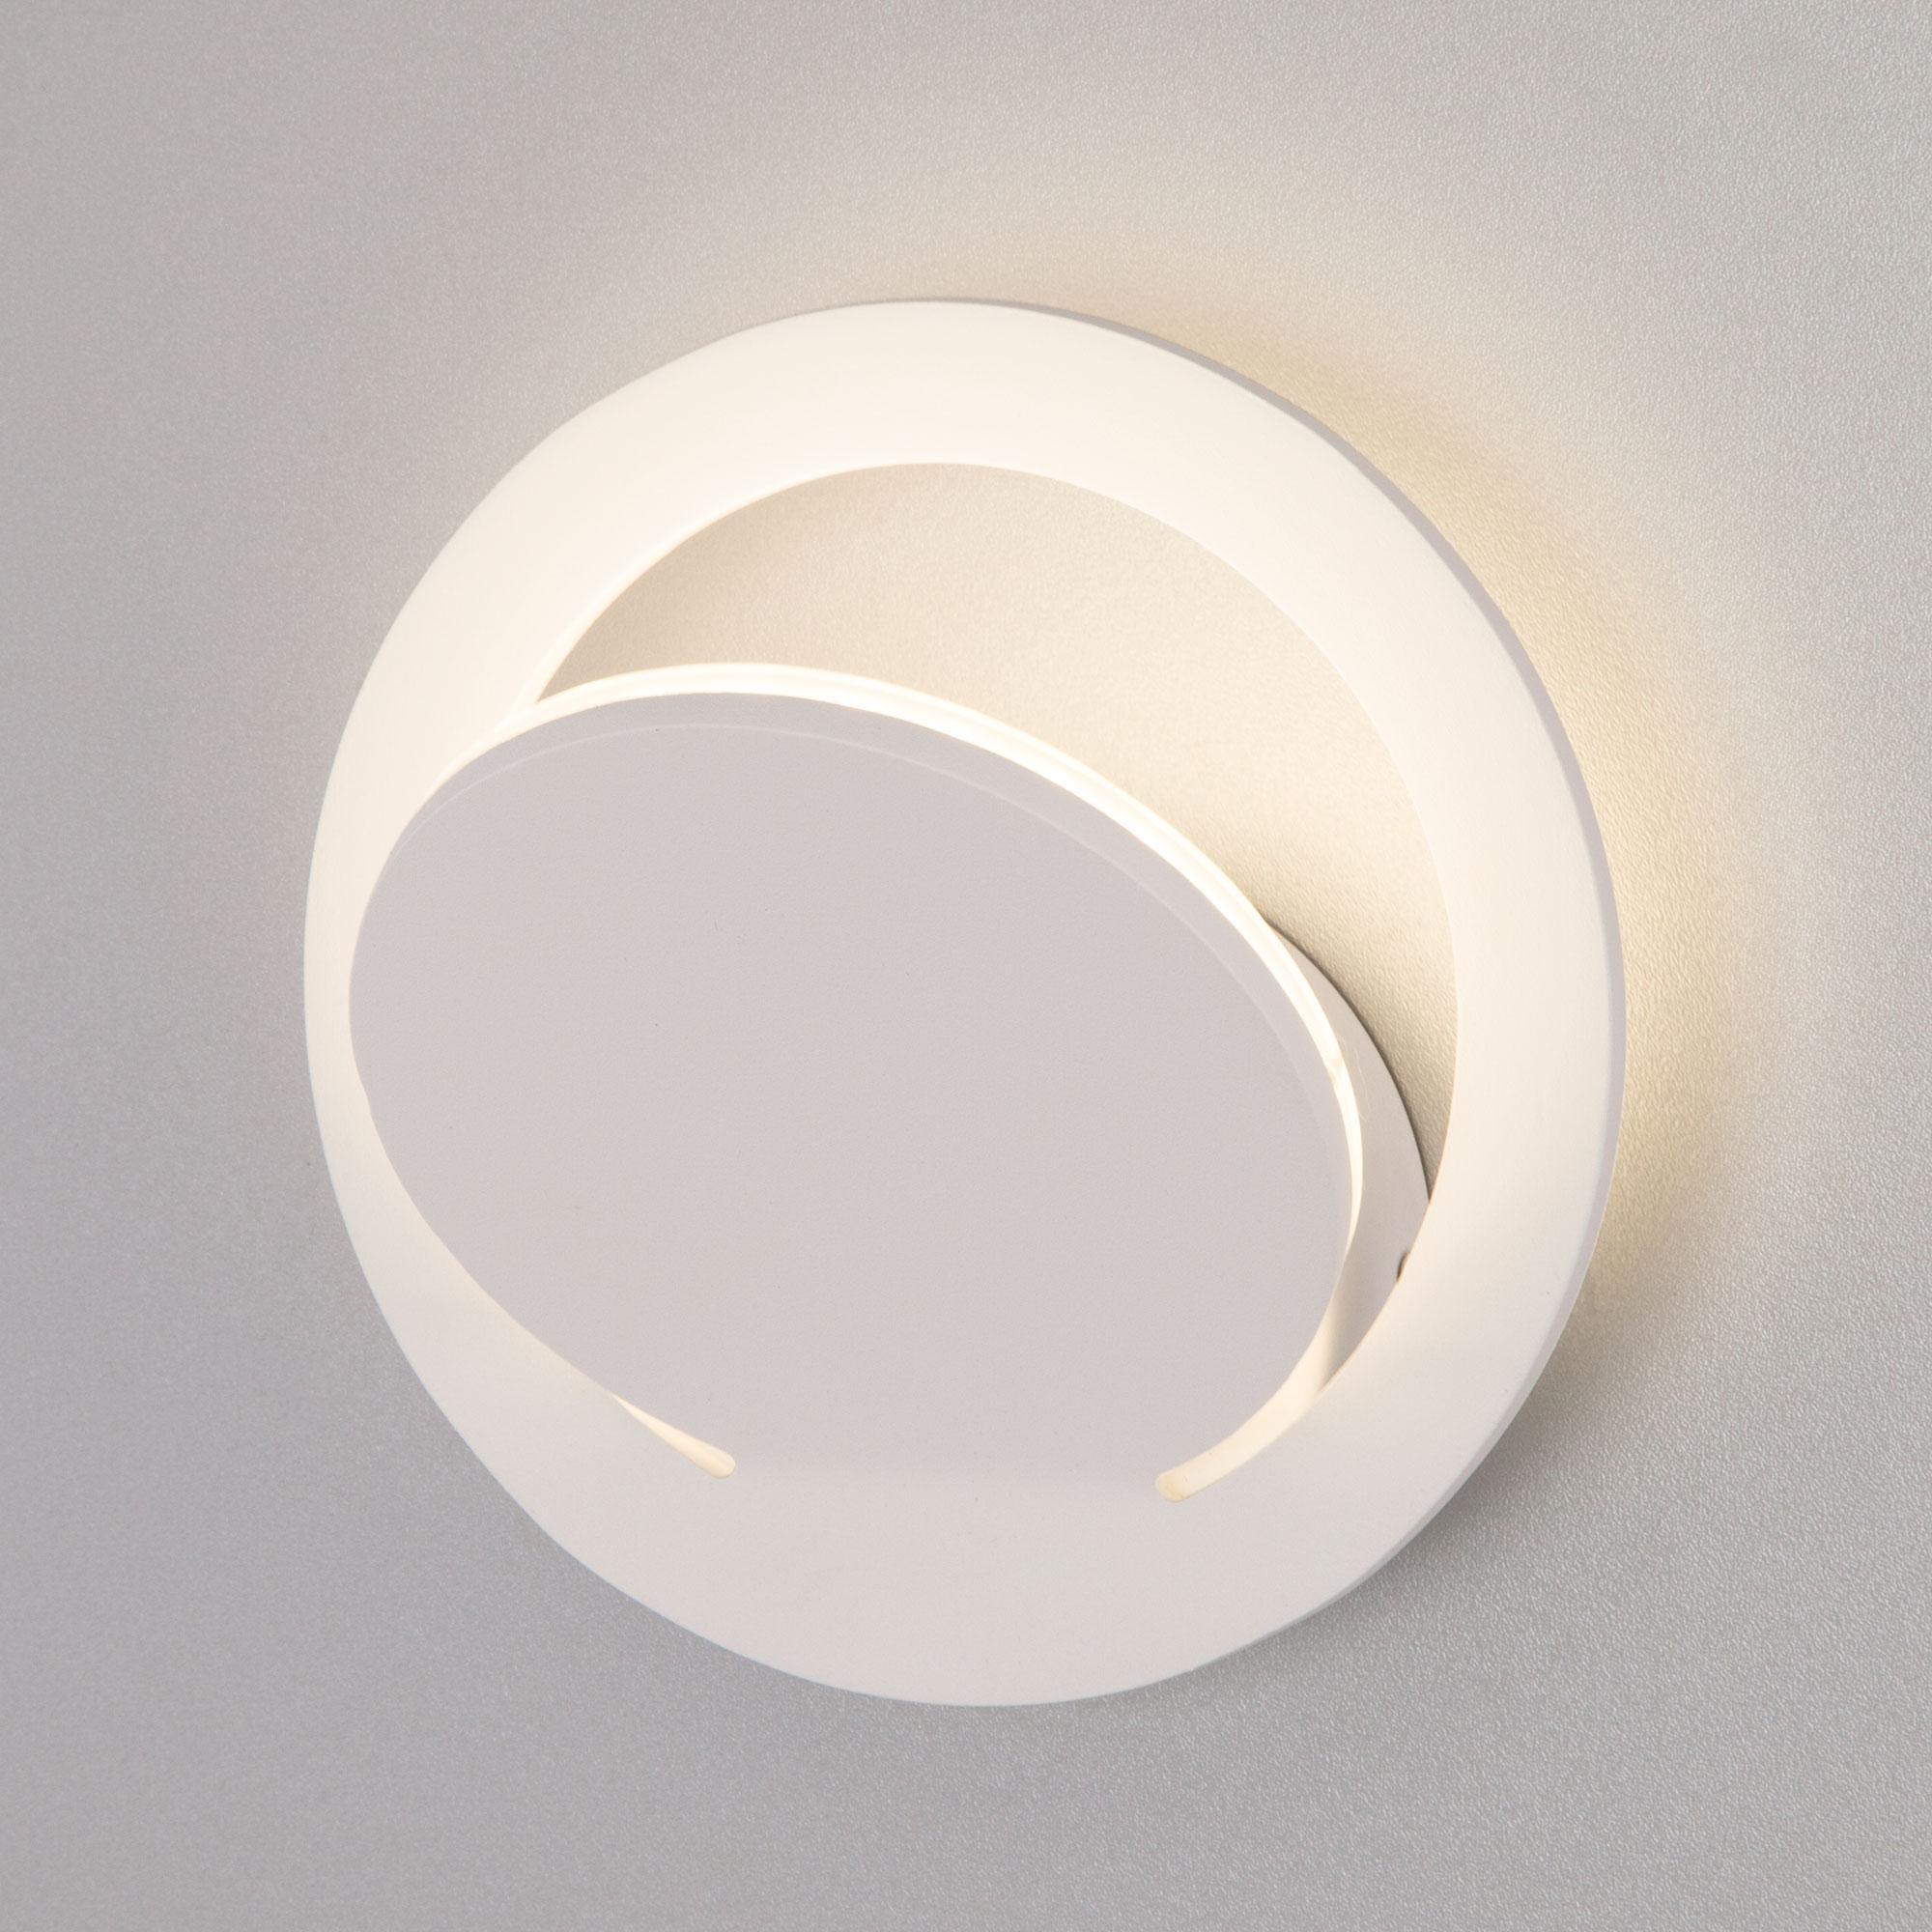 Alero LED белый (MRL LED 1010)